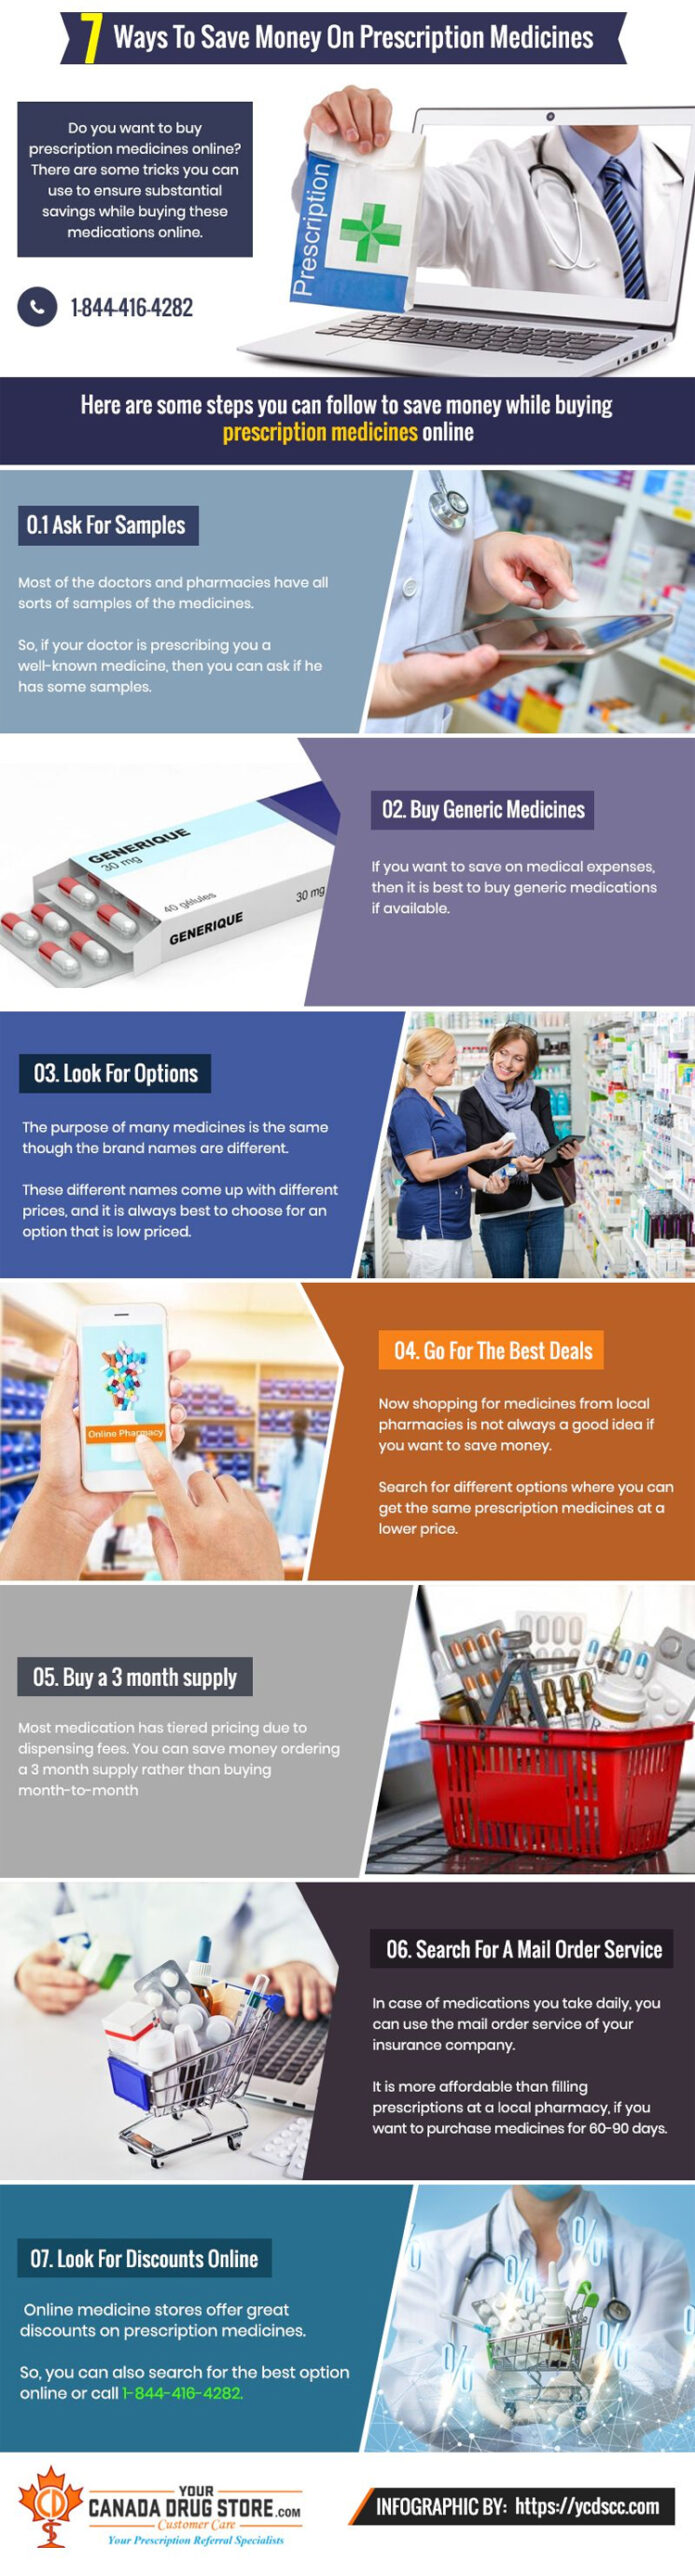 7 Ways To Save Money On Prescription Medicines Infographic